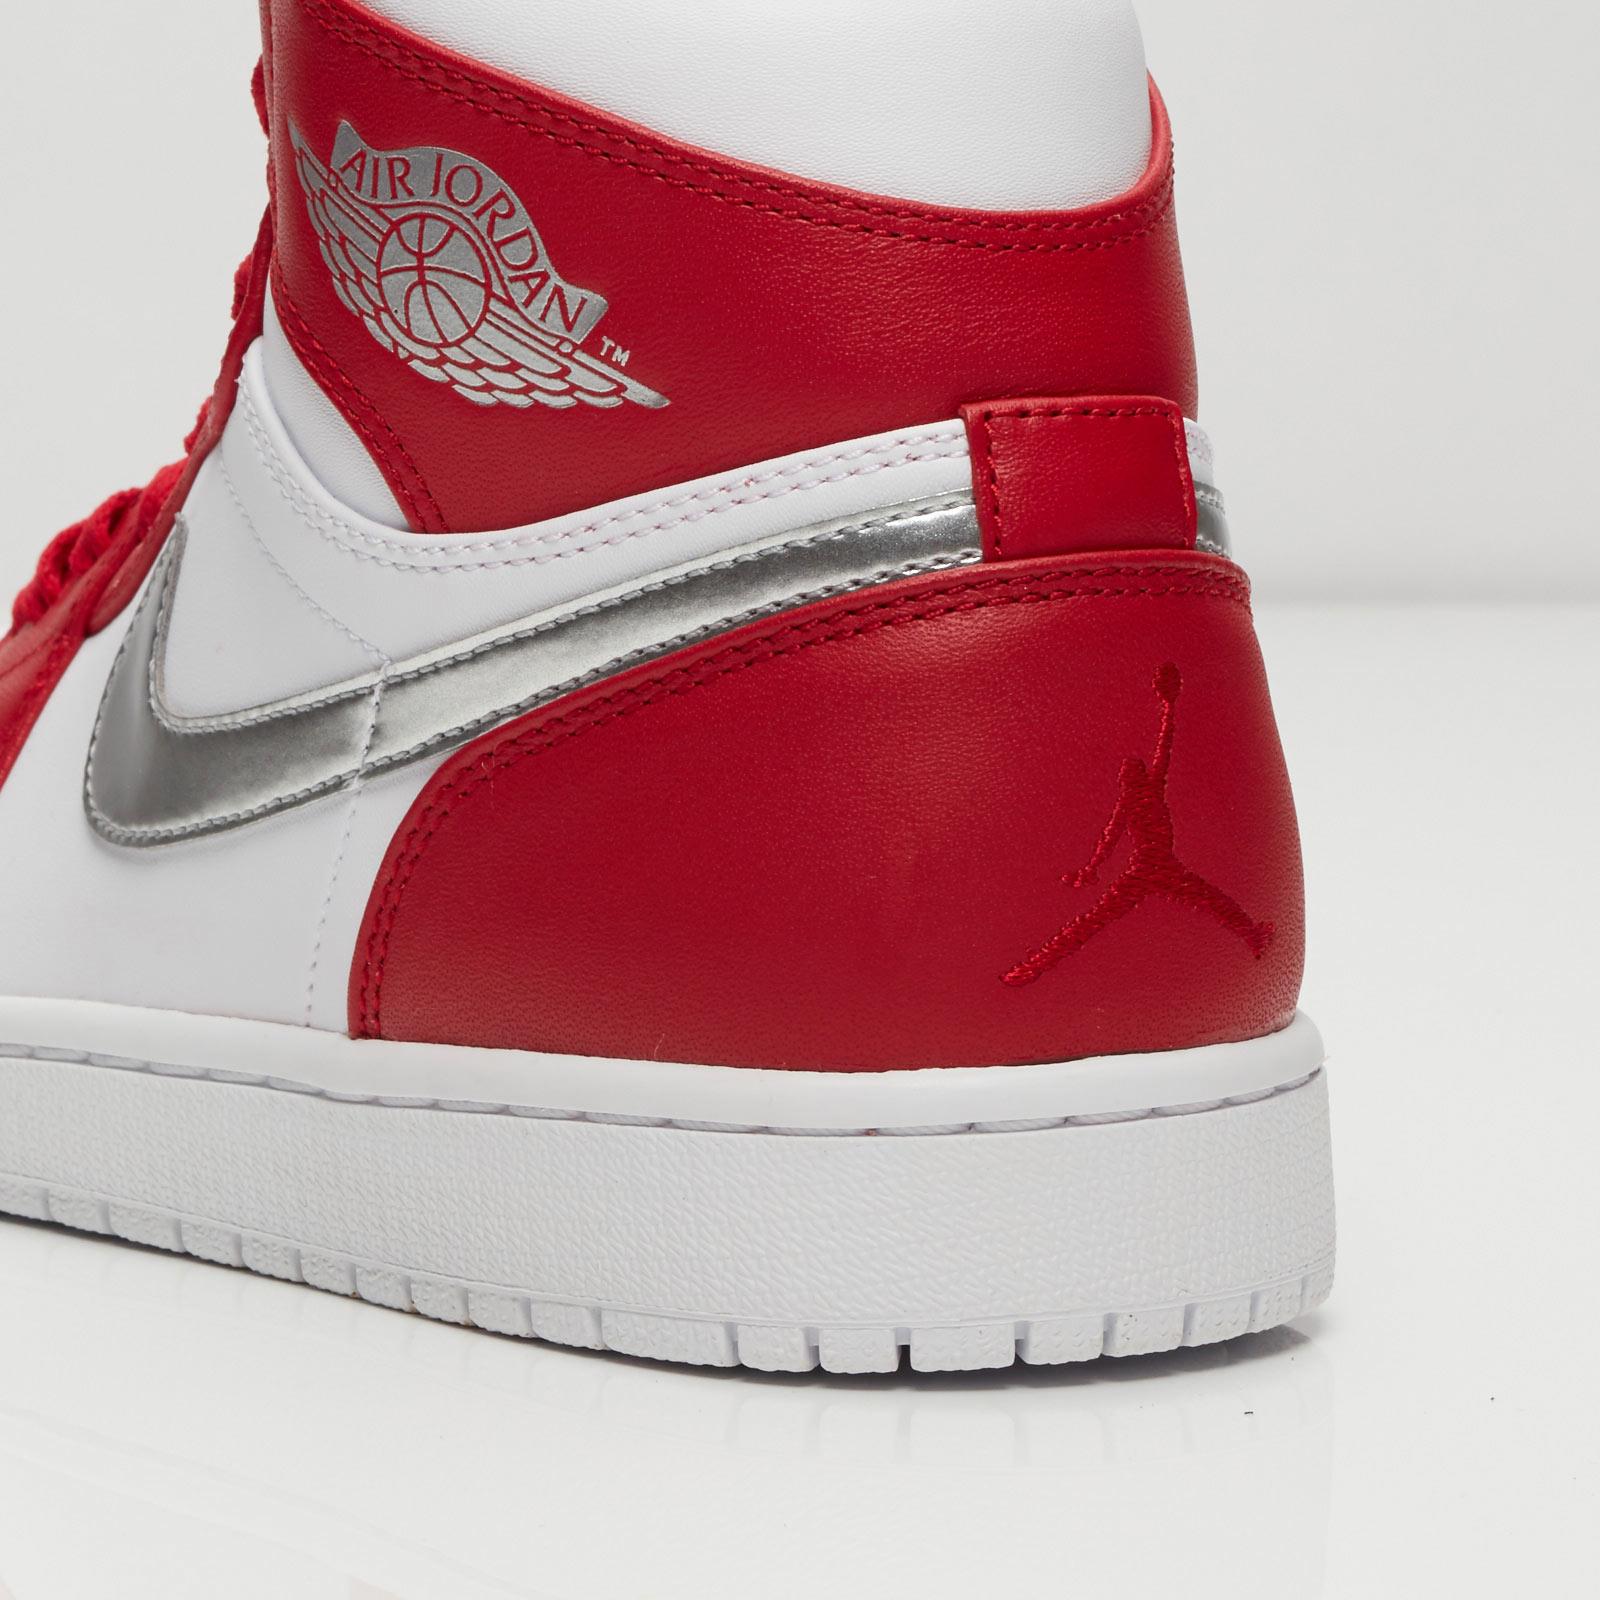 the latest c0038 4d57a Jordan Brand Air Jordan 1 Retro High - 332550-602 - Sneakersnstuff    sneakers   streetwear online since 1999